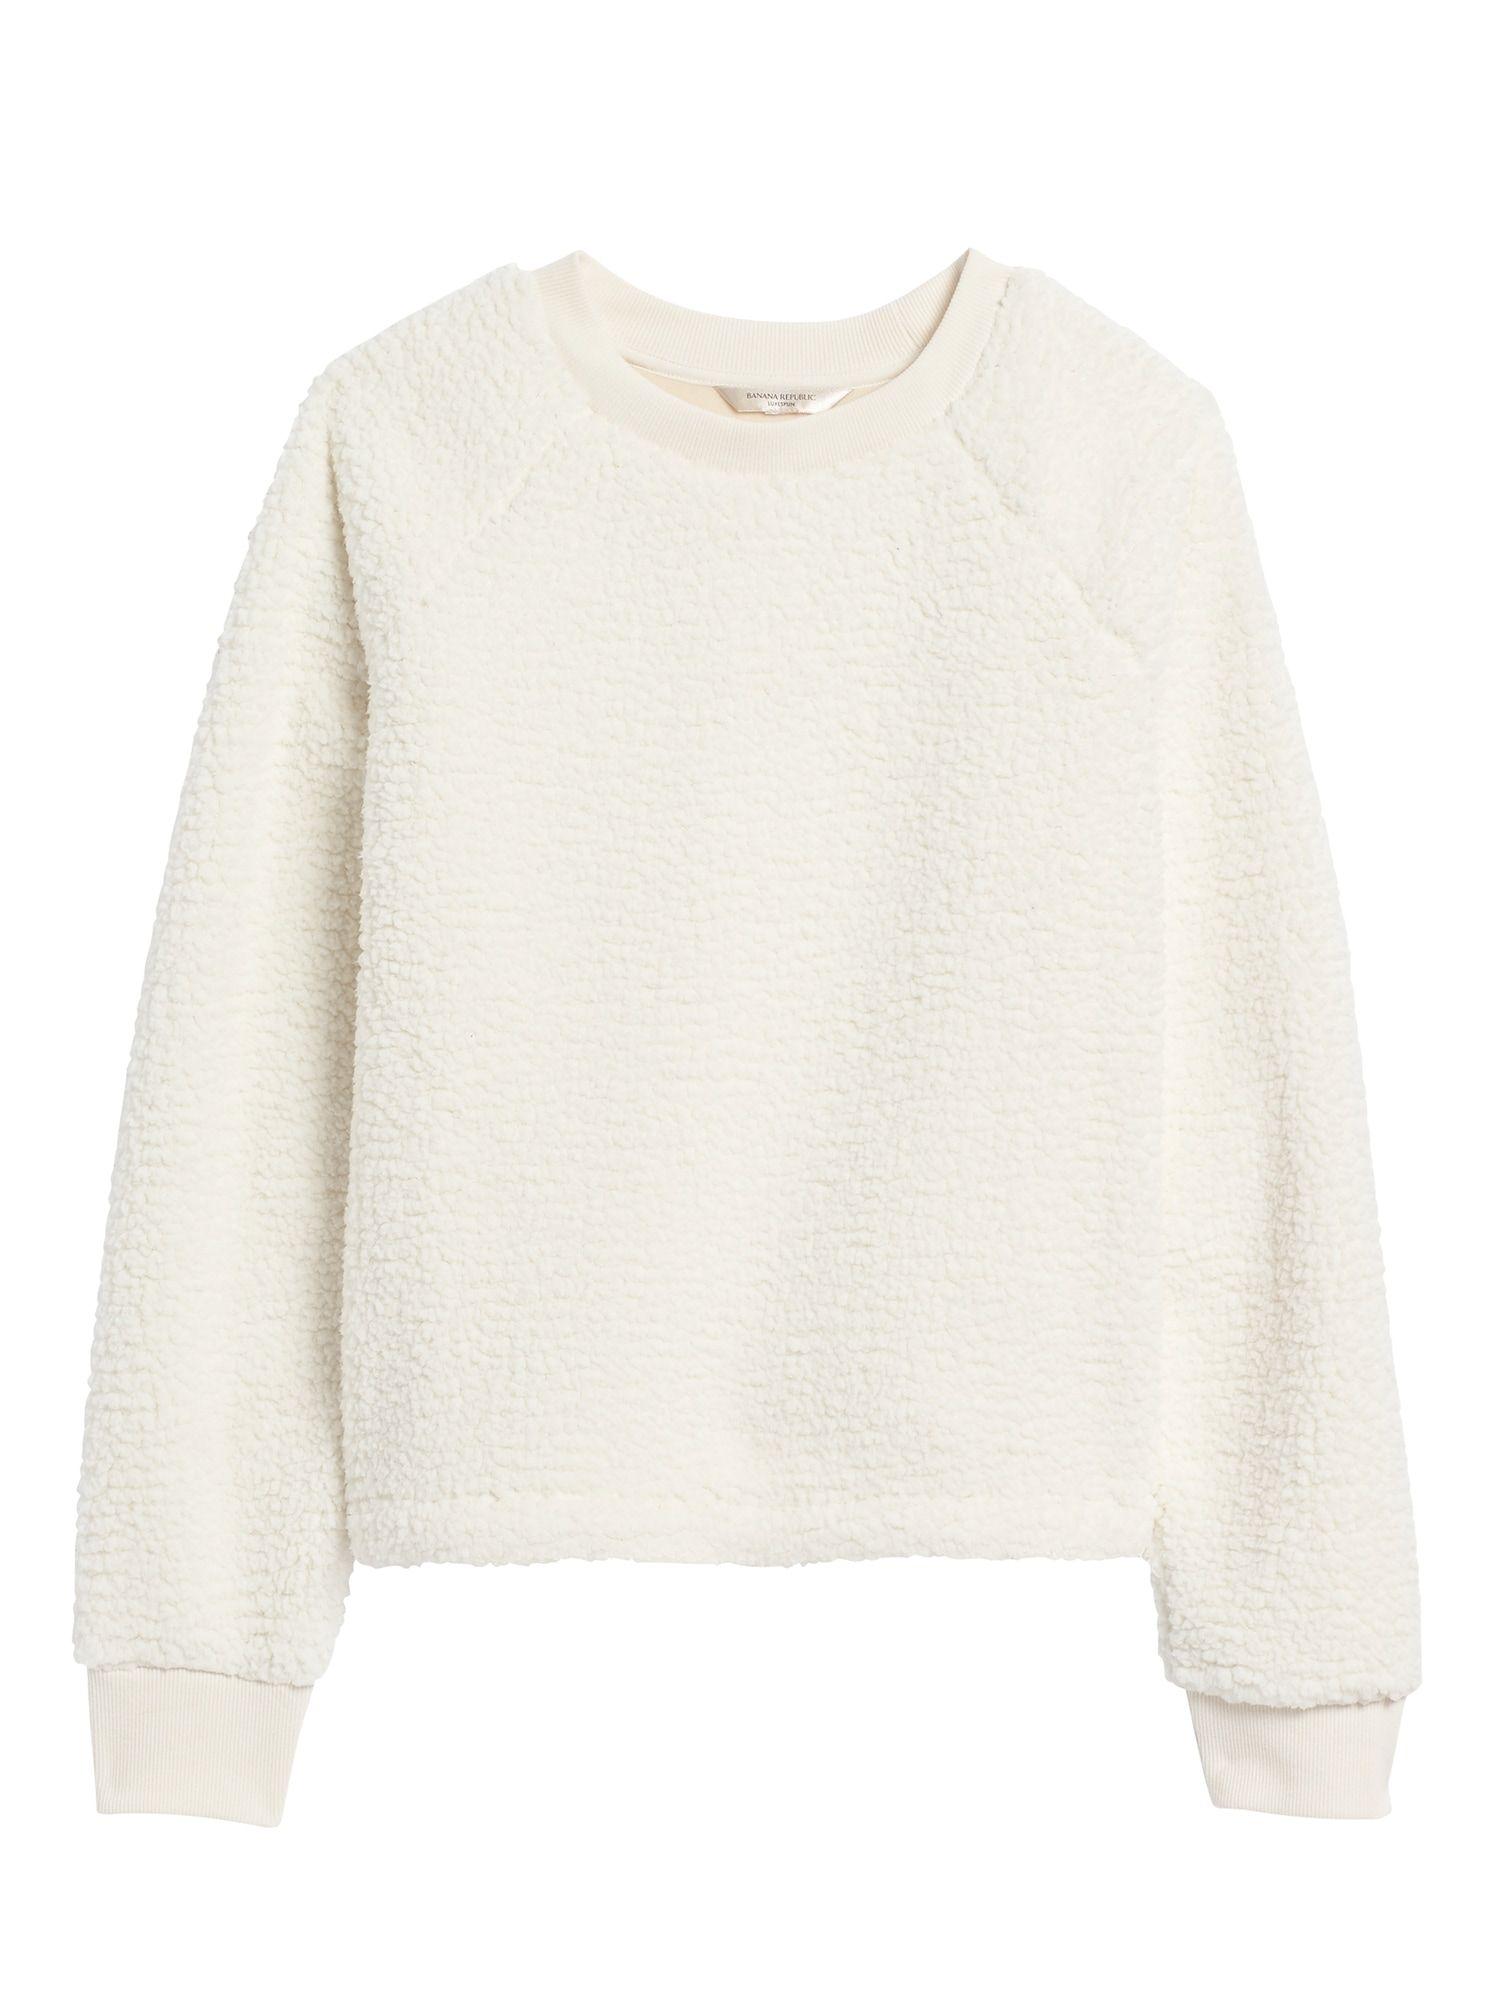 Petite Sherpa Fleece Crew Neck Sweatshirt Crew Neck Sweatshirt Business Casual Outfits Refined Clothing [ 2000 x 1500 Pixel ]